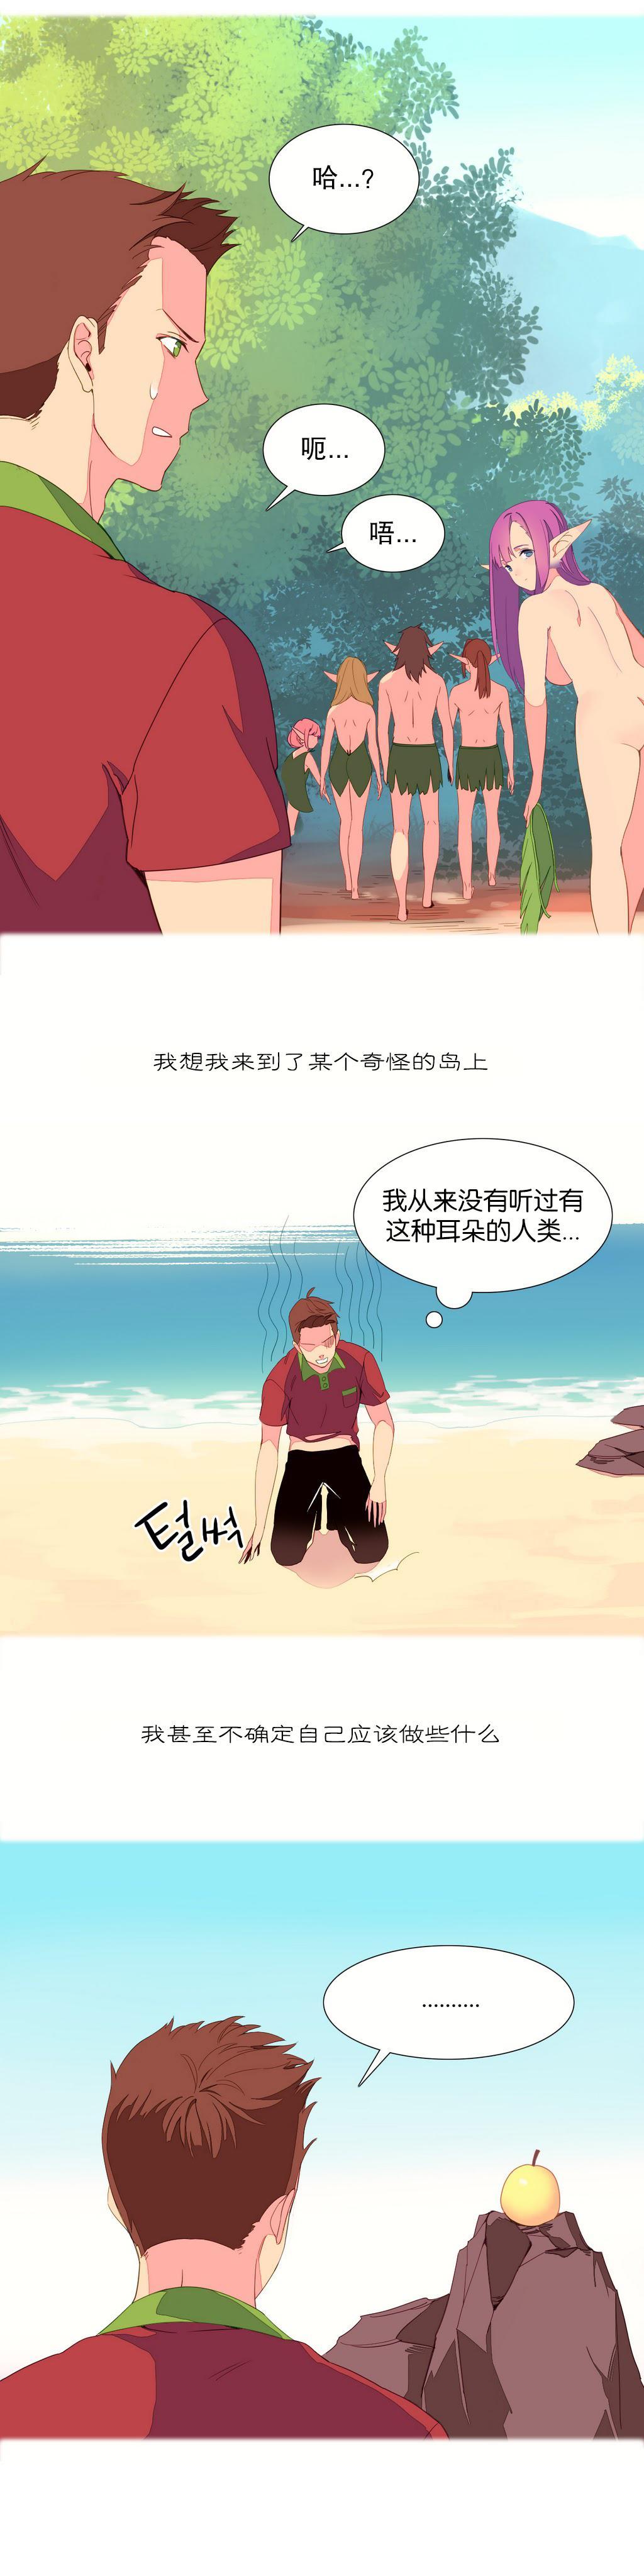 [Rozer] 一个由我统治的世界(A World that I Rule) Ch.1-3 [Chinese] 56